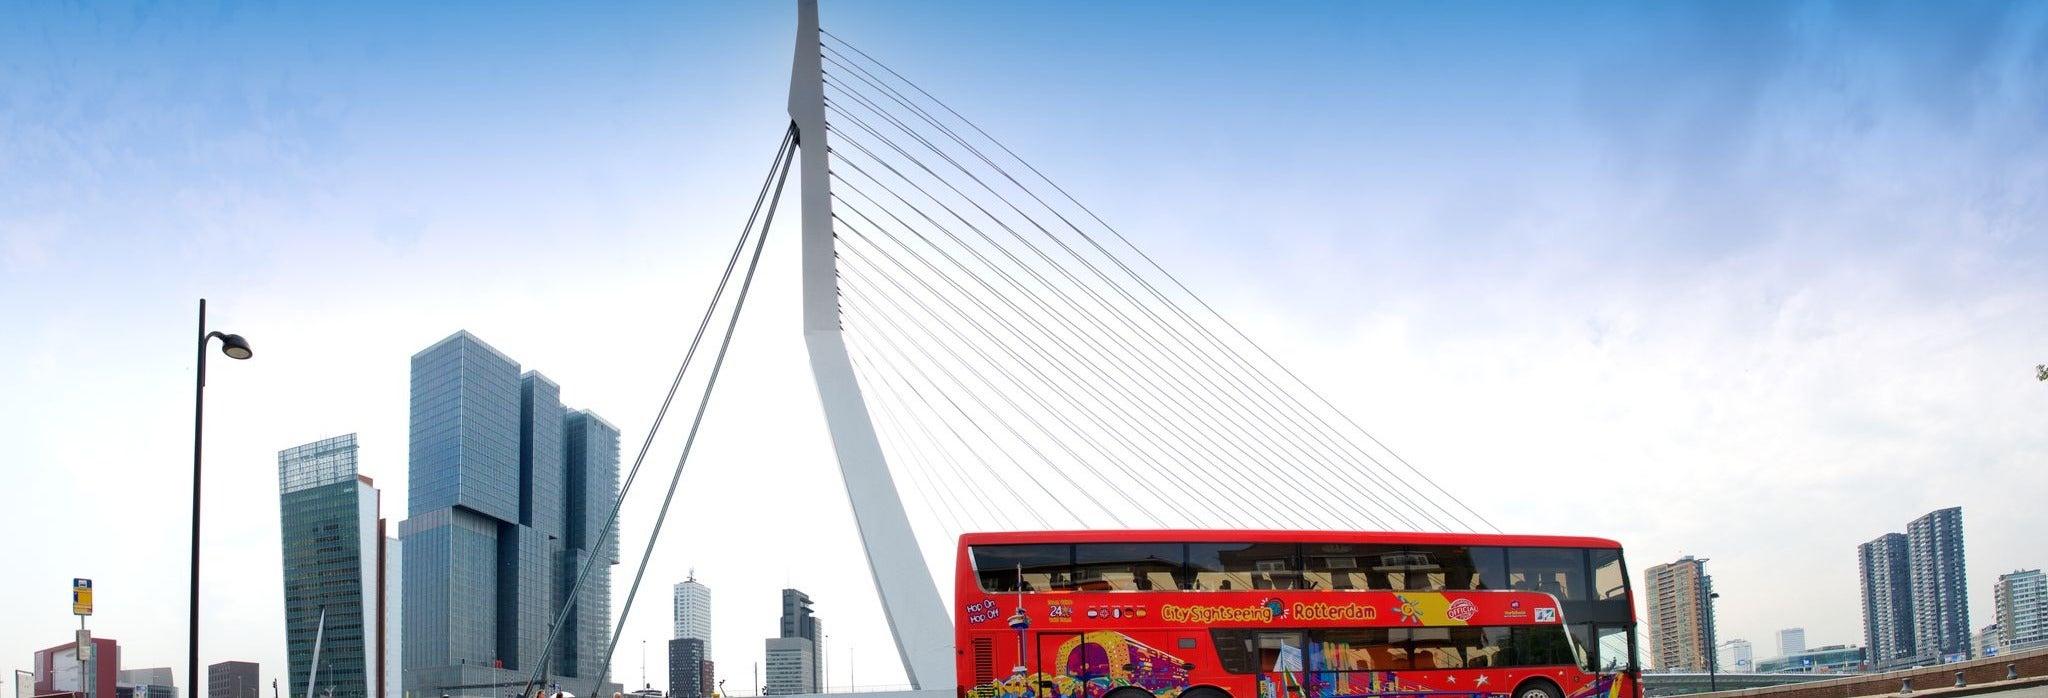 Ônibus turístico de Roterdã